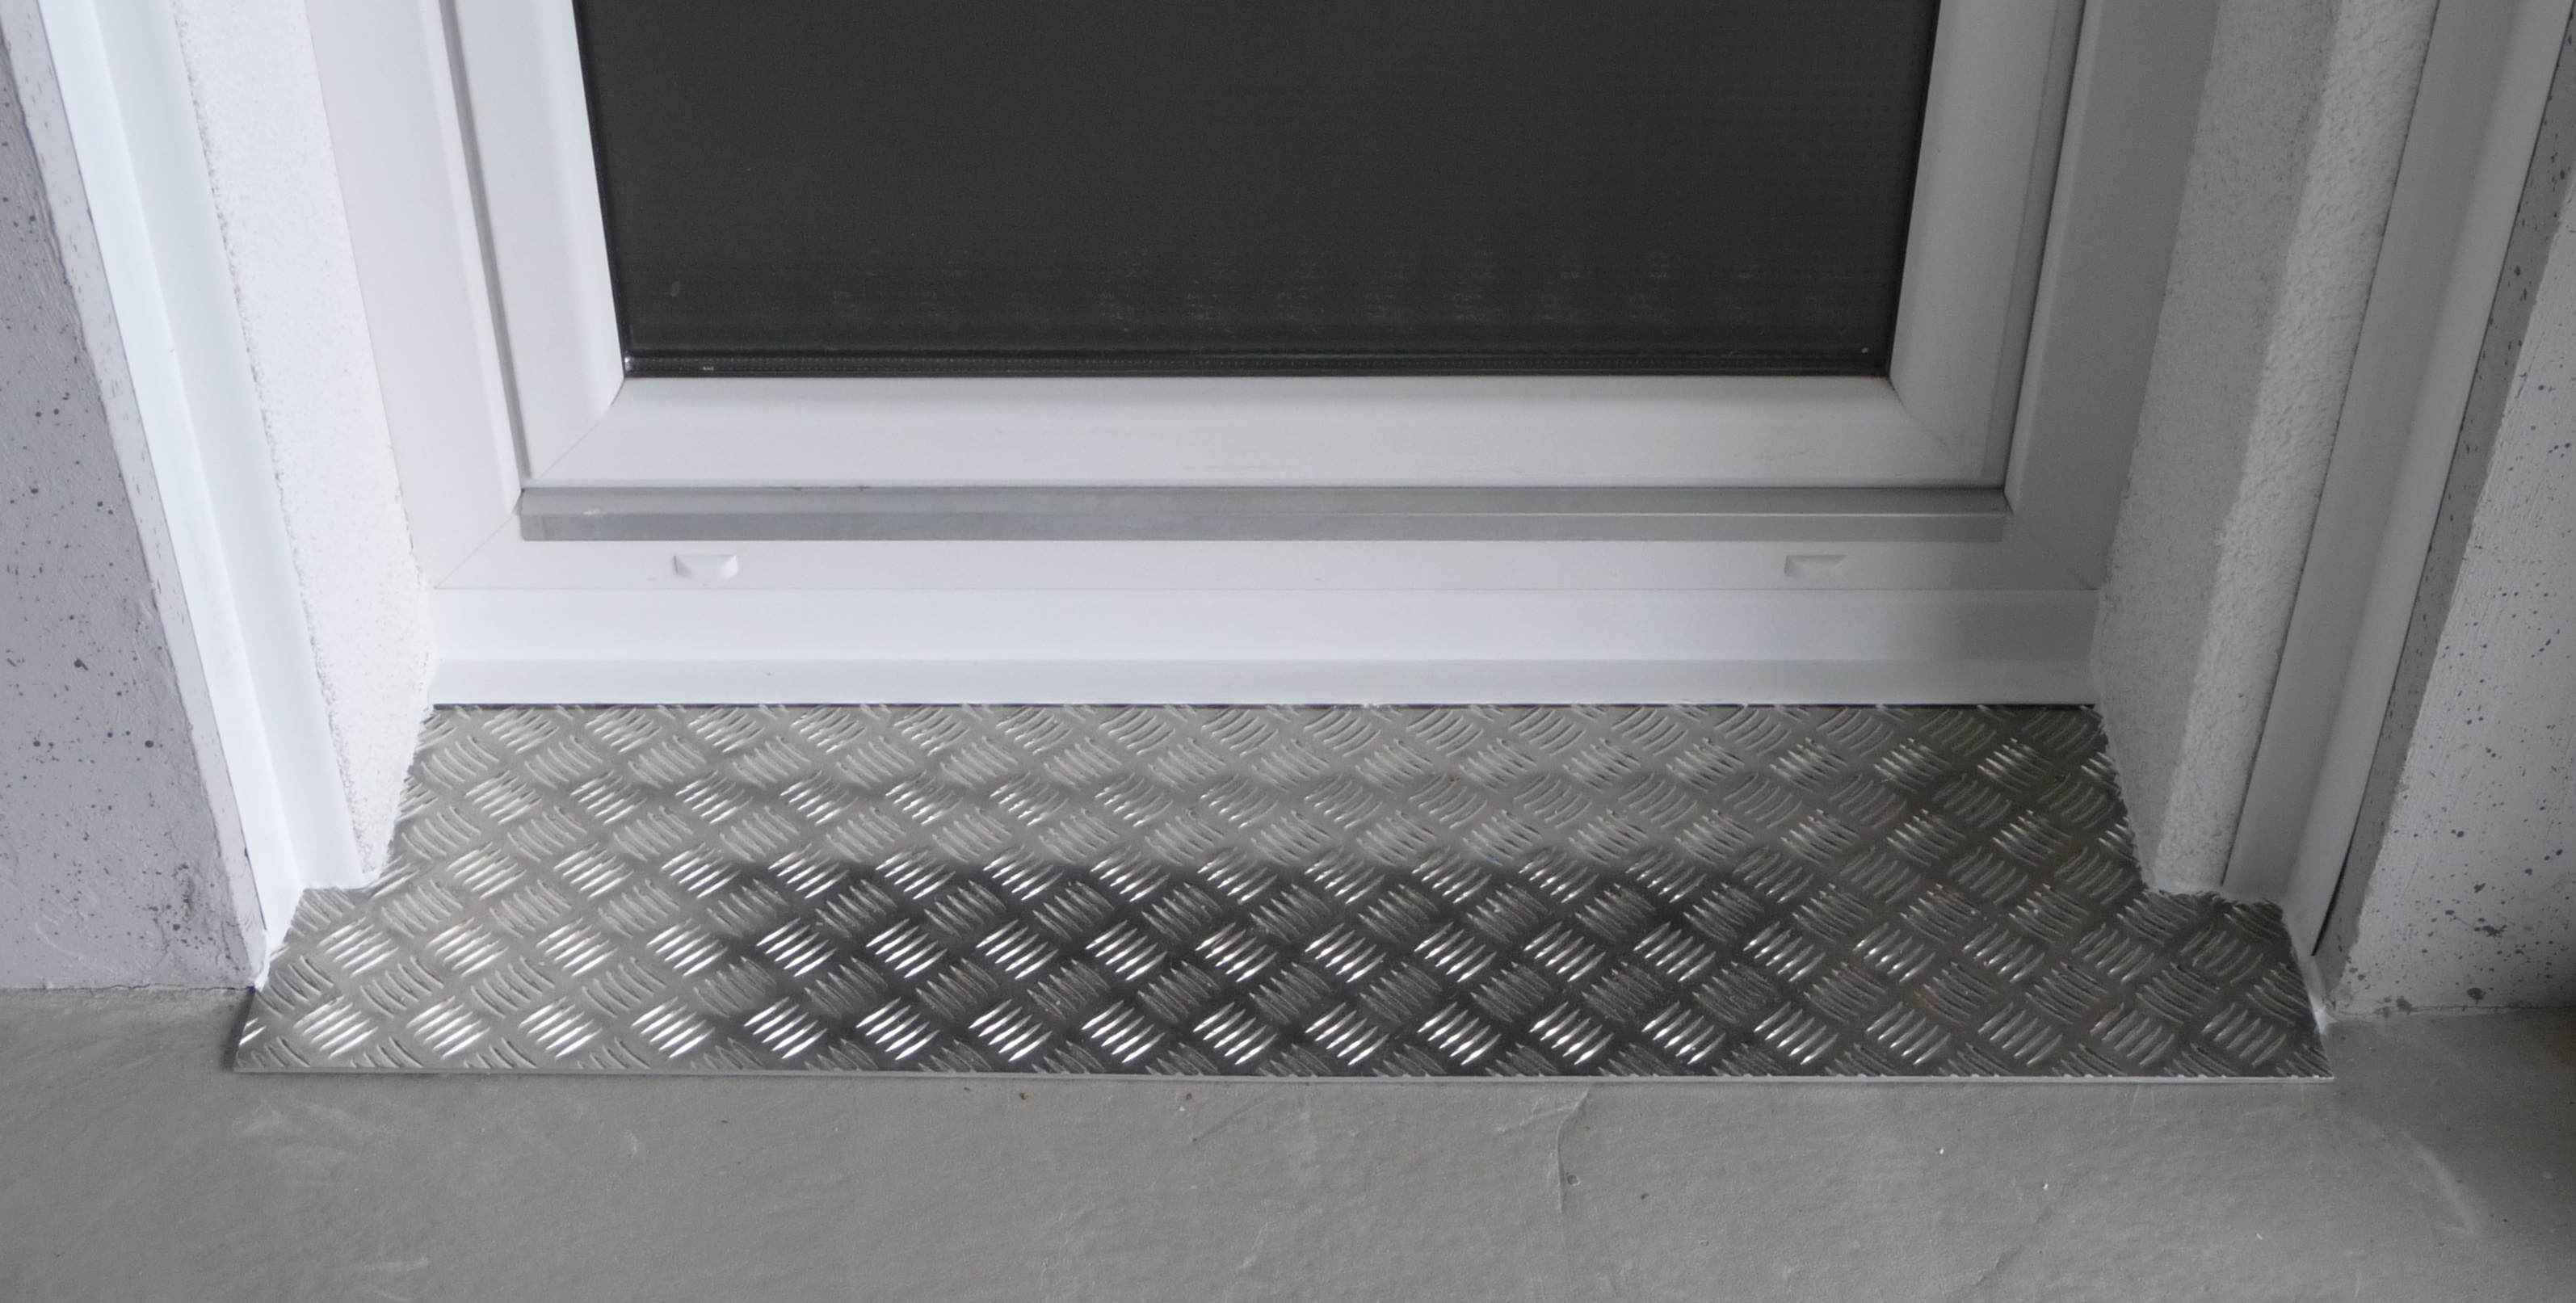 Seuil de porte d'entree aluminium et verre